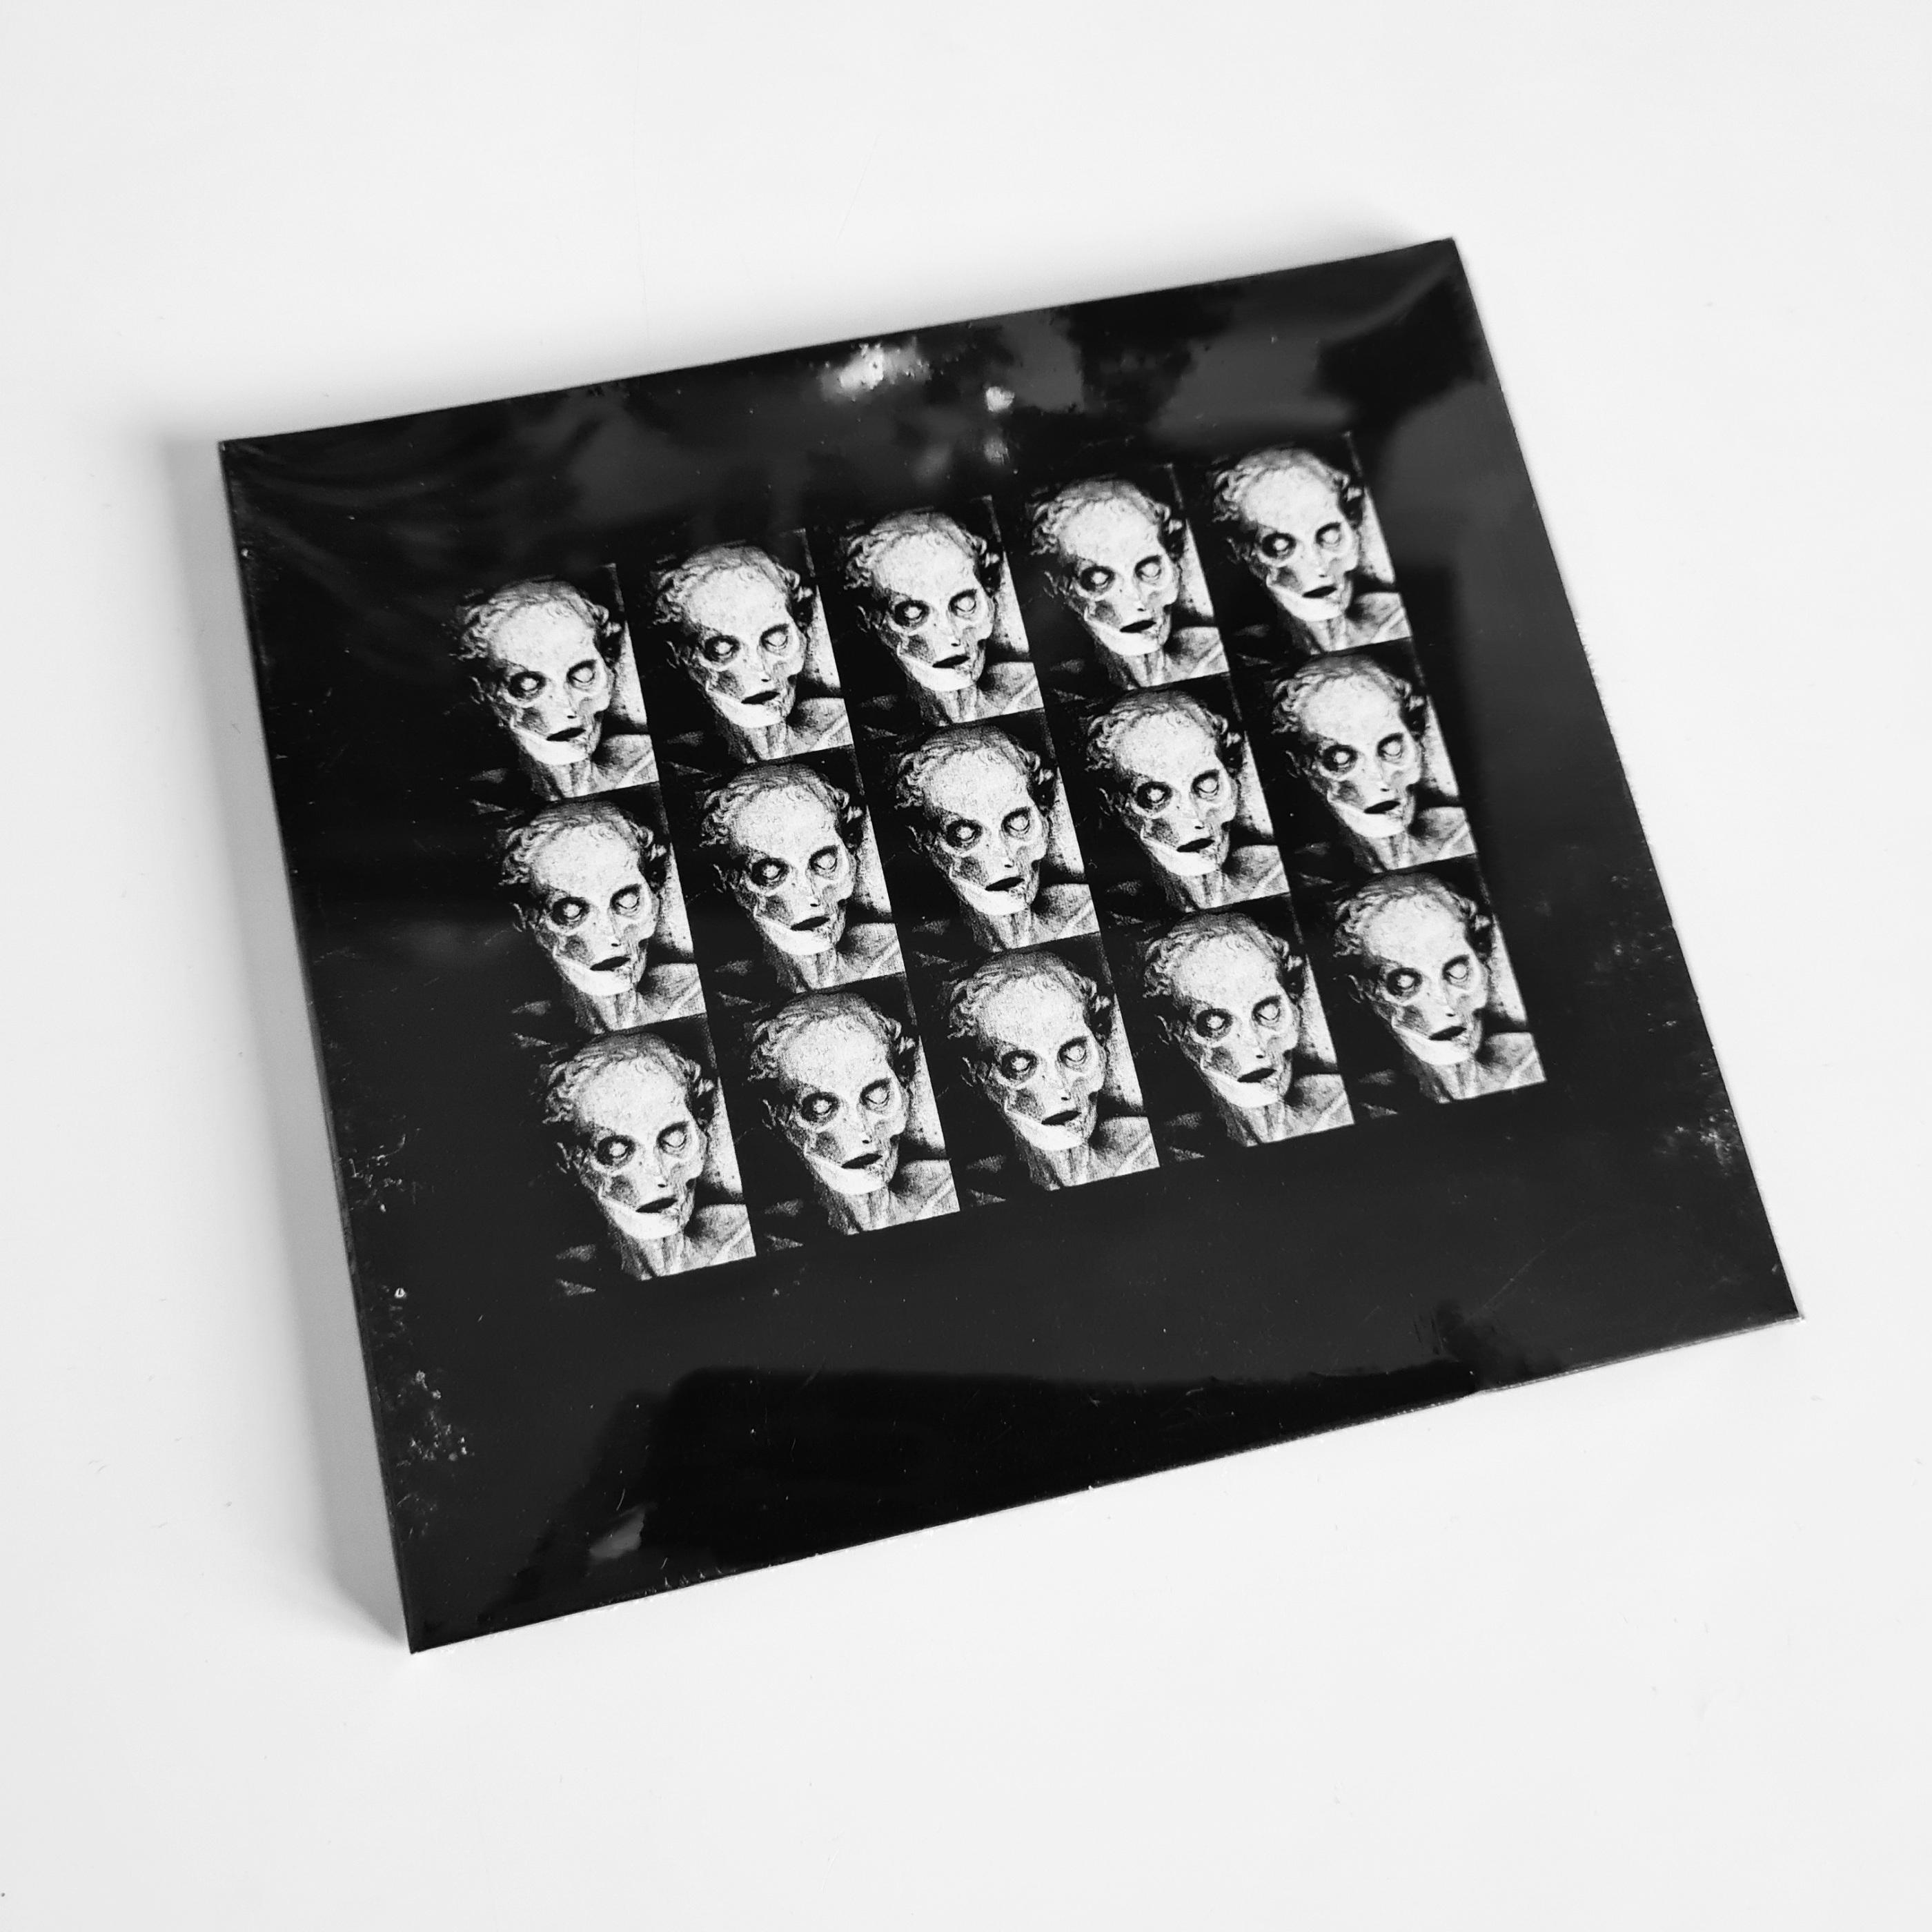 MHÖNOS - Miserere Nostri CD